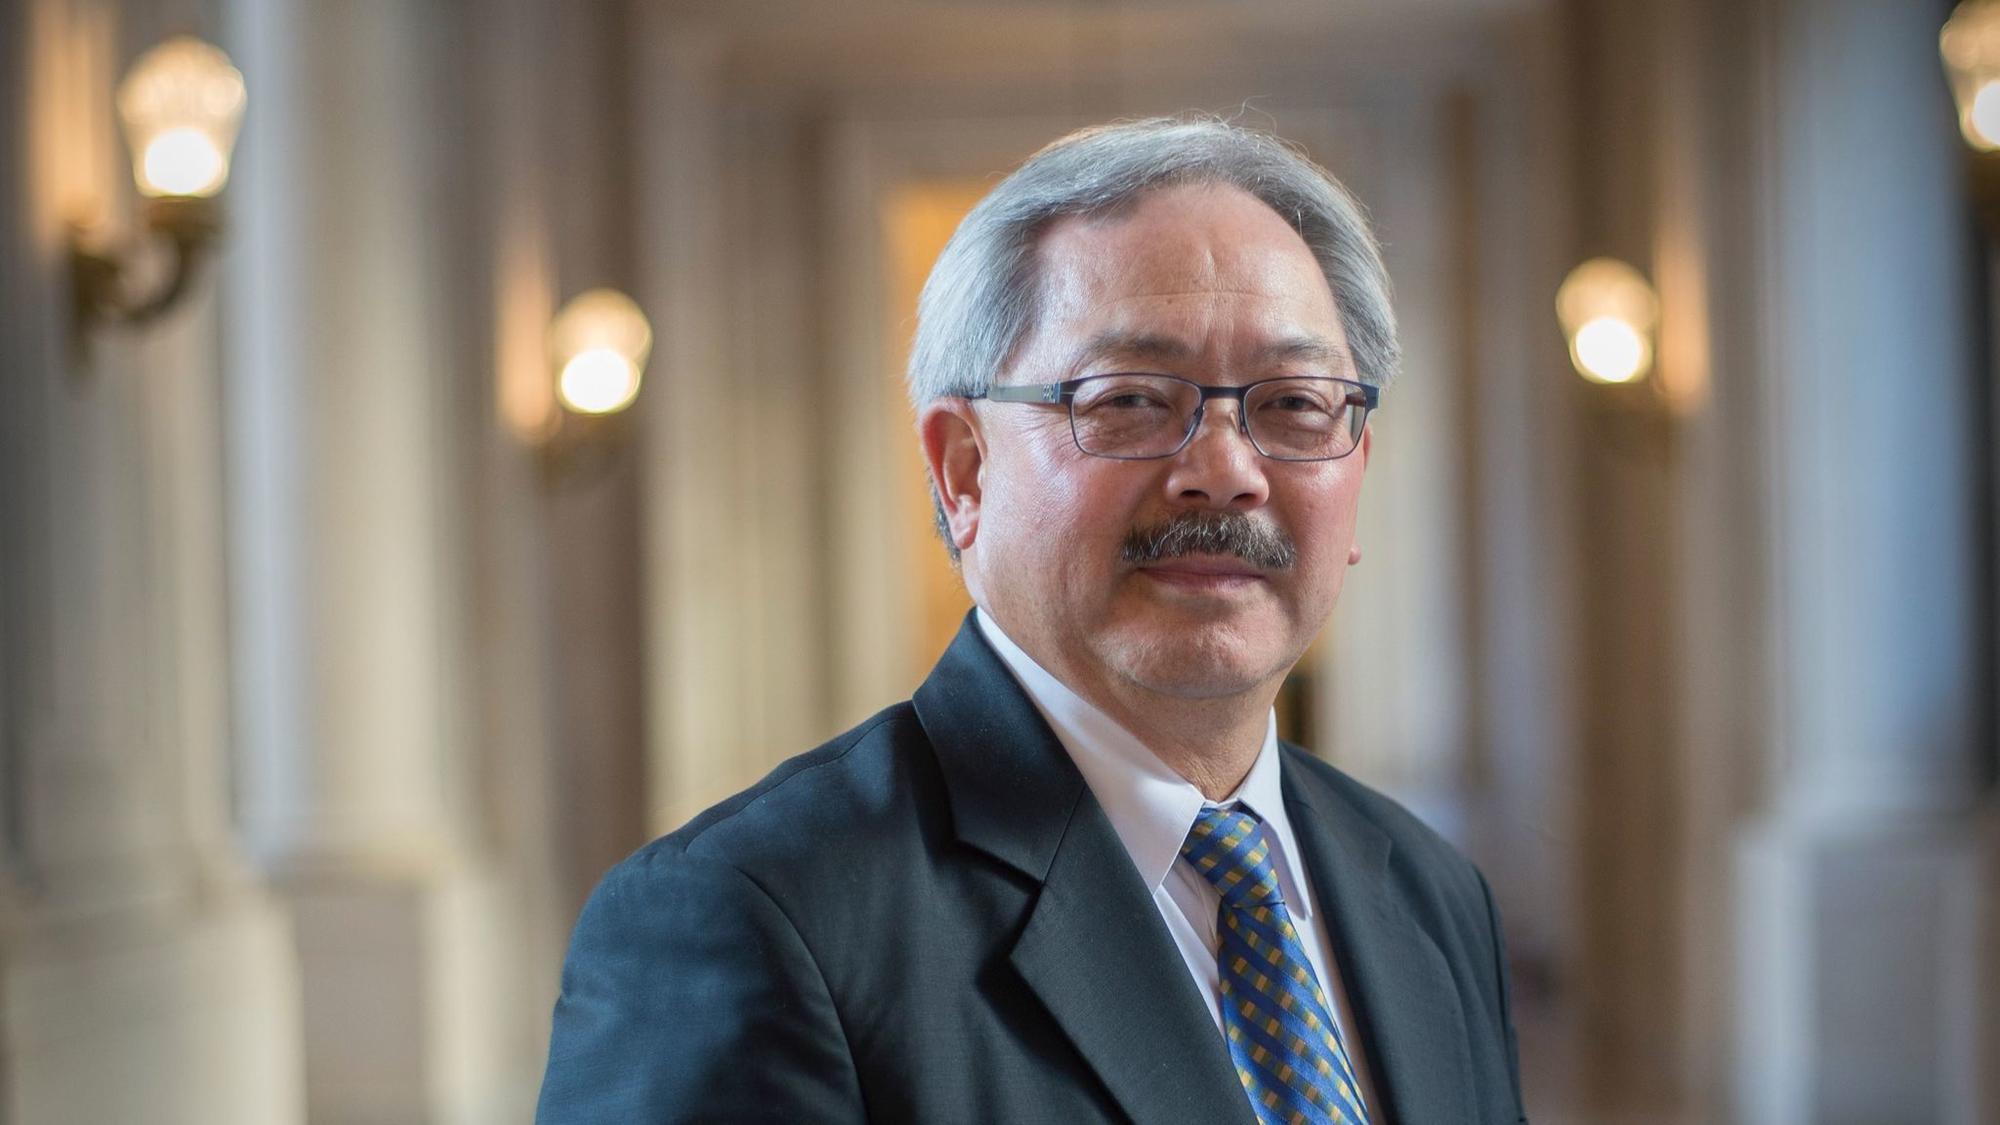 San Francisco remembers Mayor Ed Lee in day of memorials